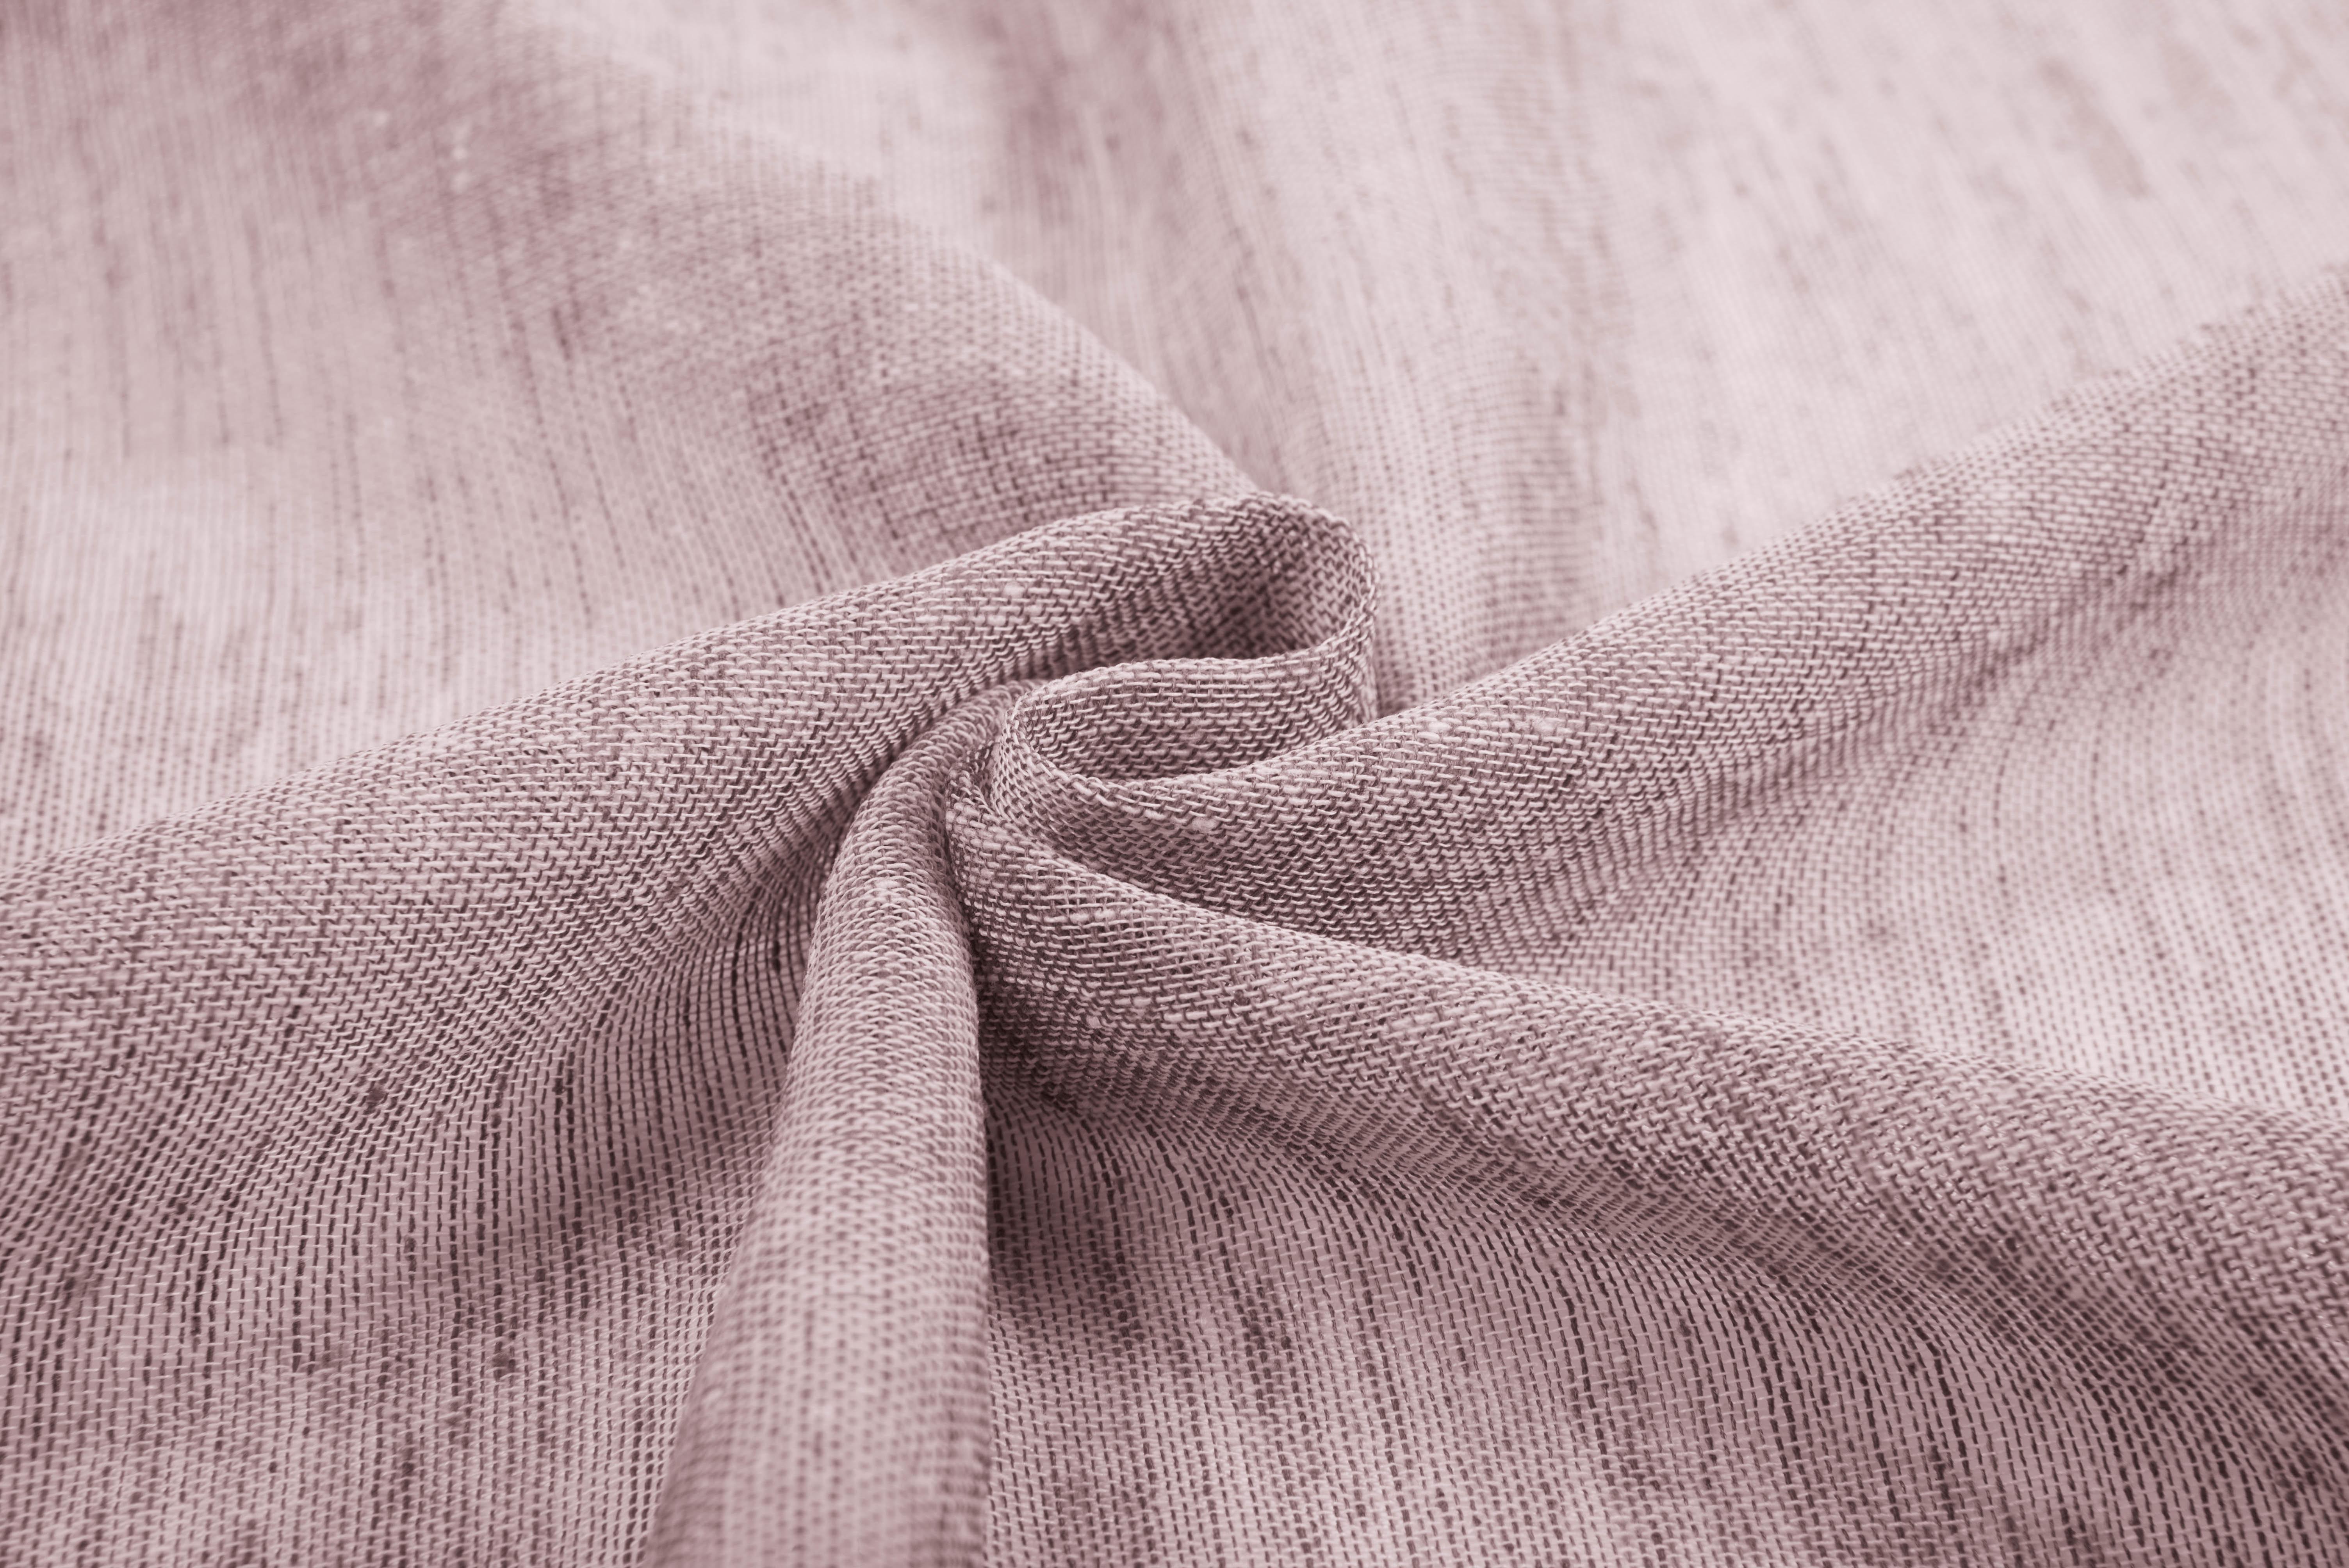 TexRepublic Материал Портьерная ткань Snow-covered Цвет: Брусника